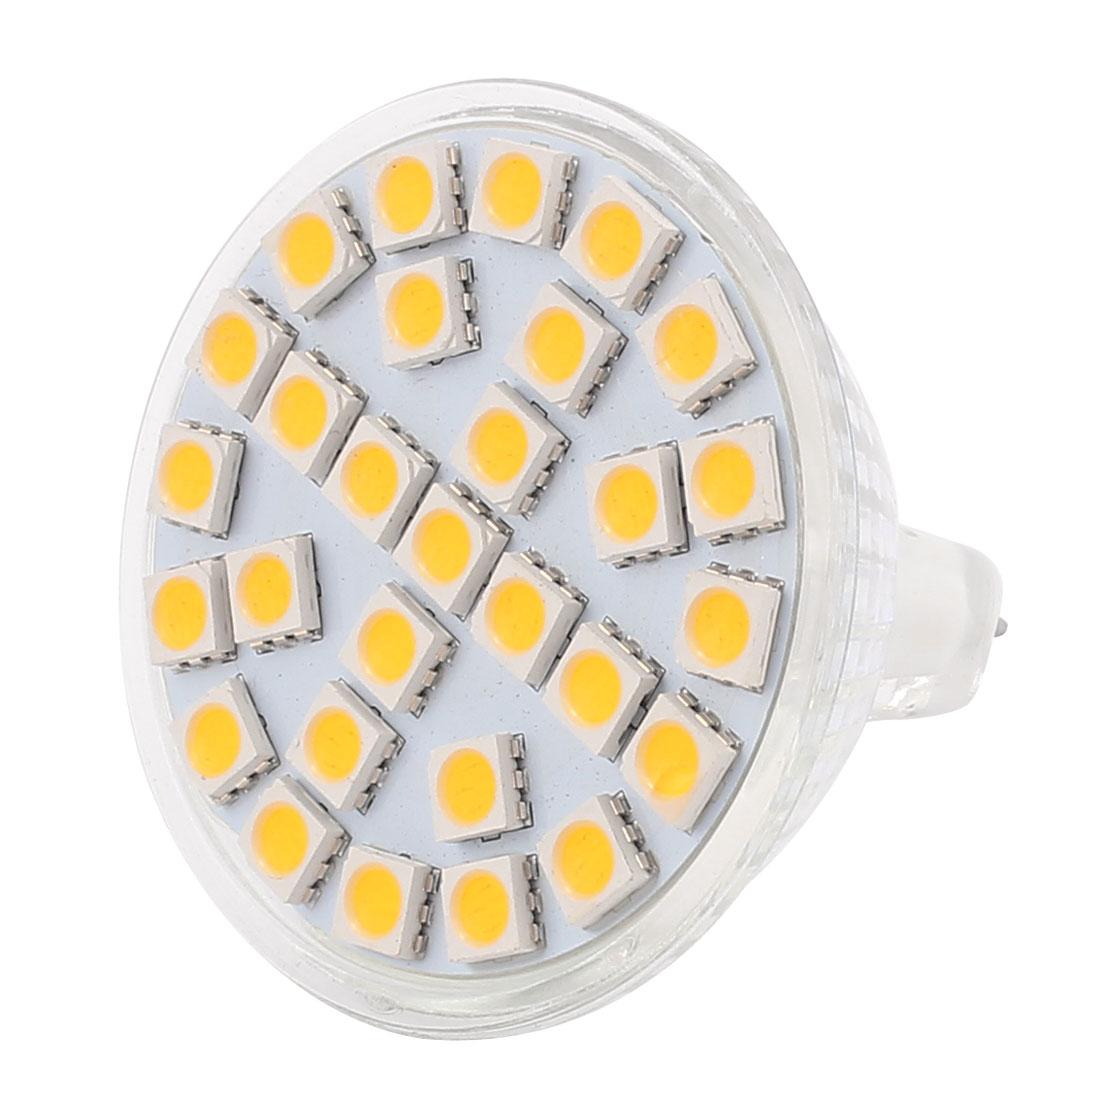 MR16 SMD5050 29LEDs 5W Glass Energy Saving LED Lamp Bulb Warm White AC 110V